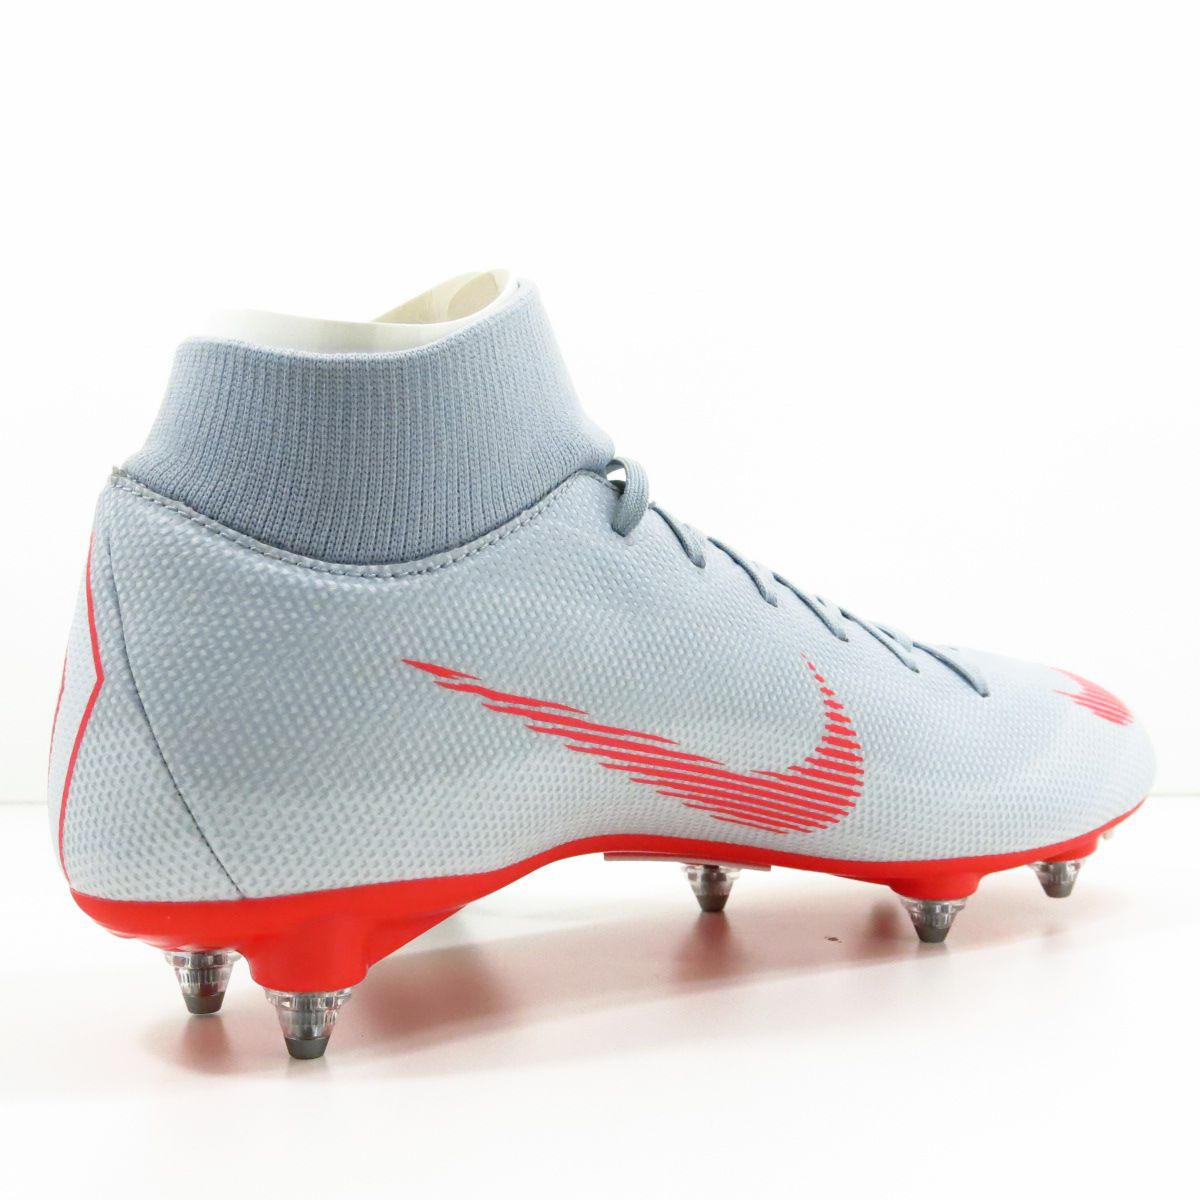 Chuteira Nike Mercurial Superfly Academy SG